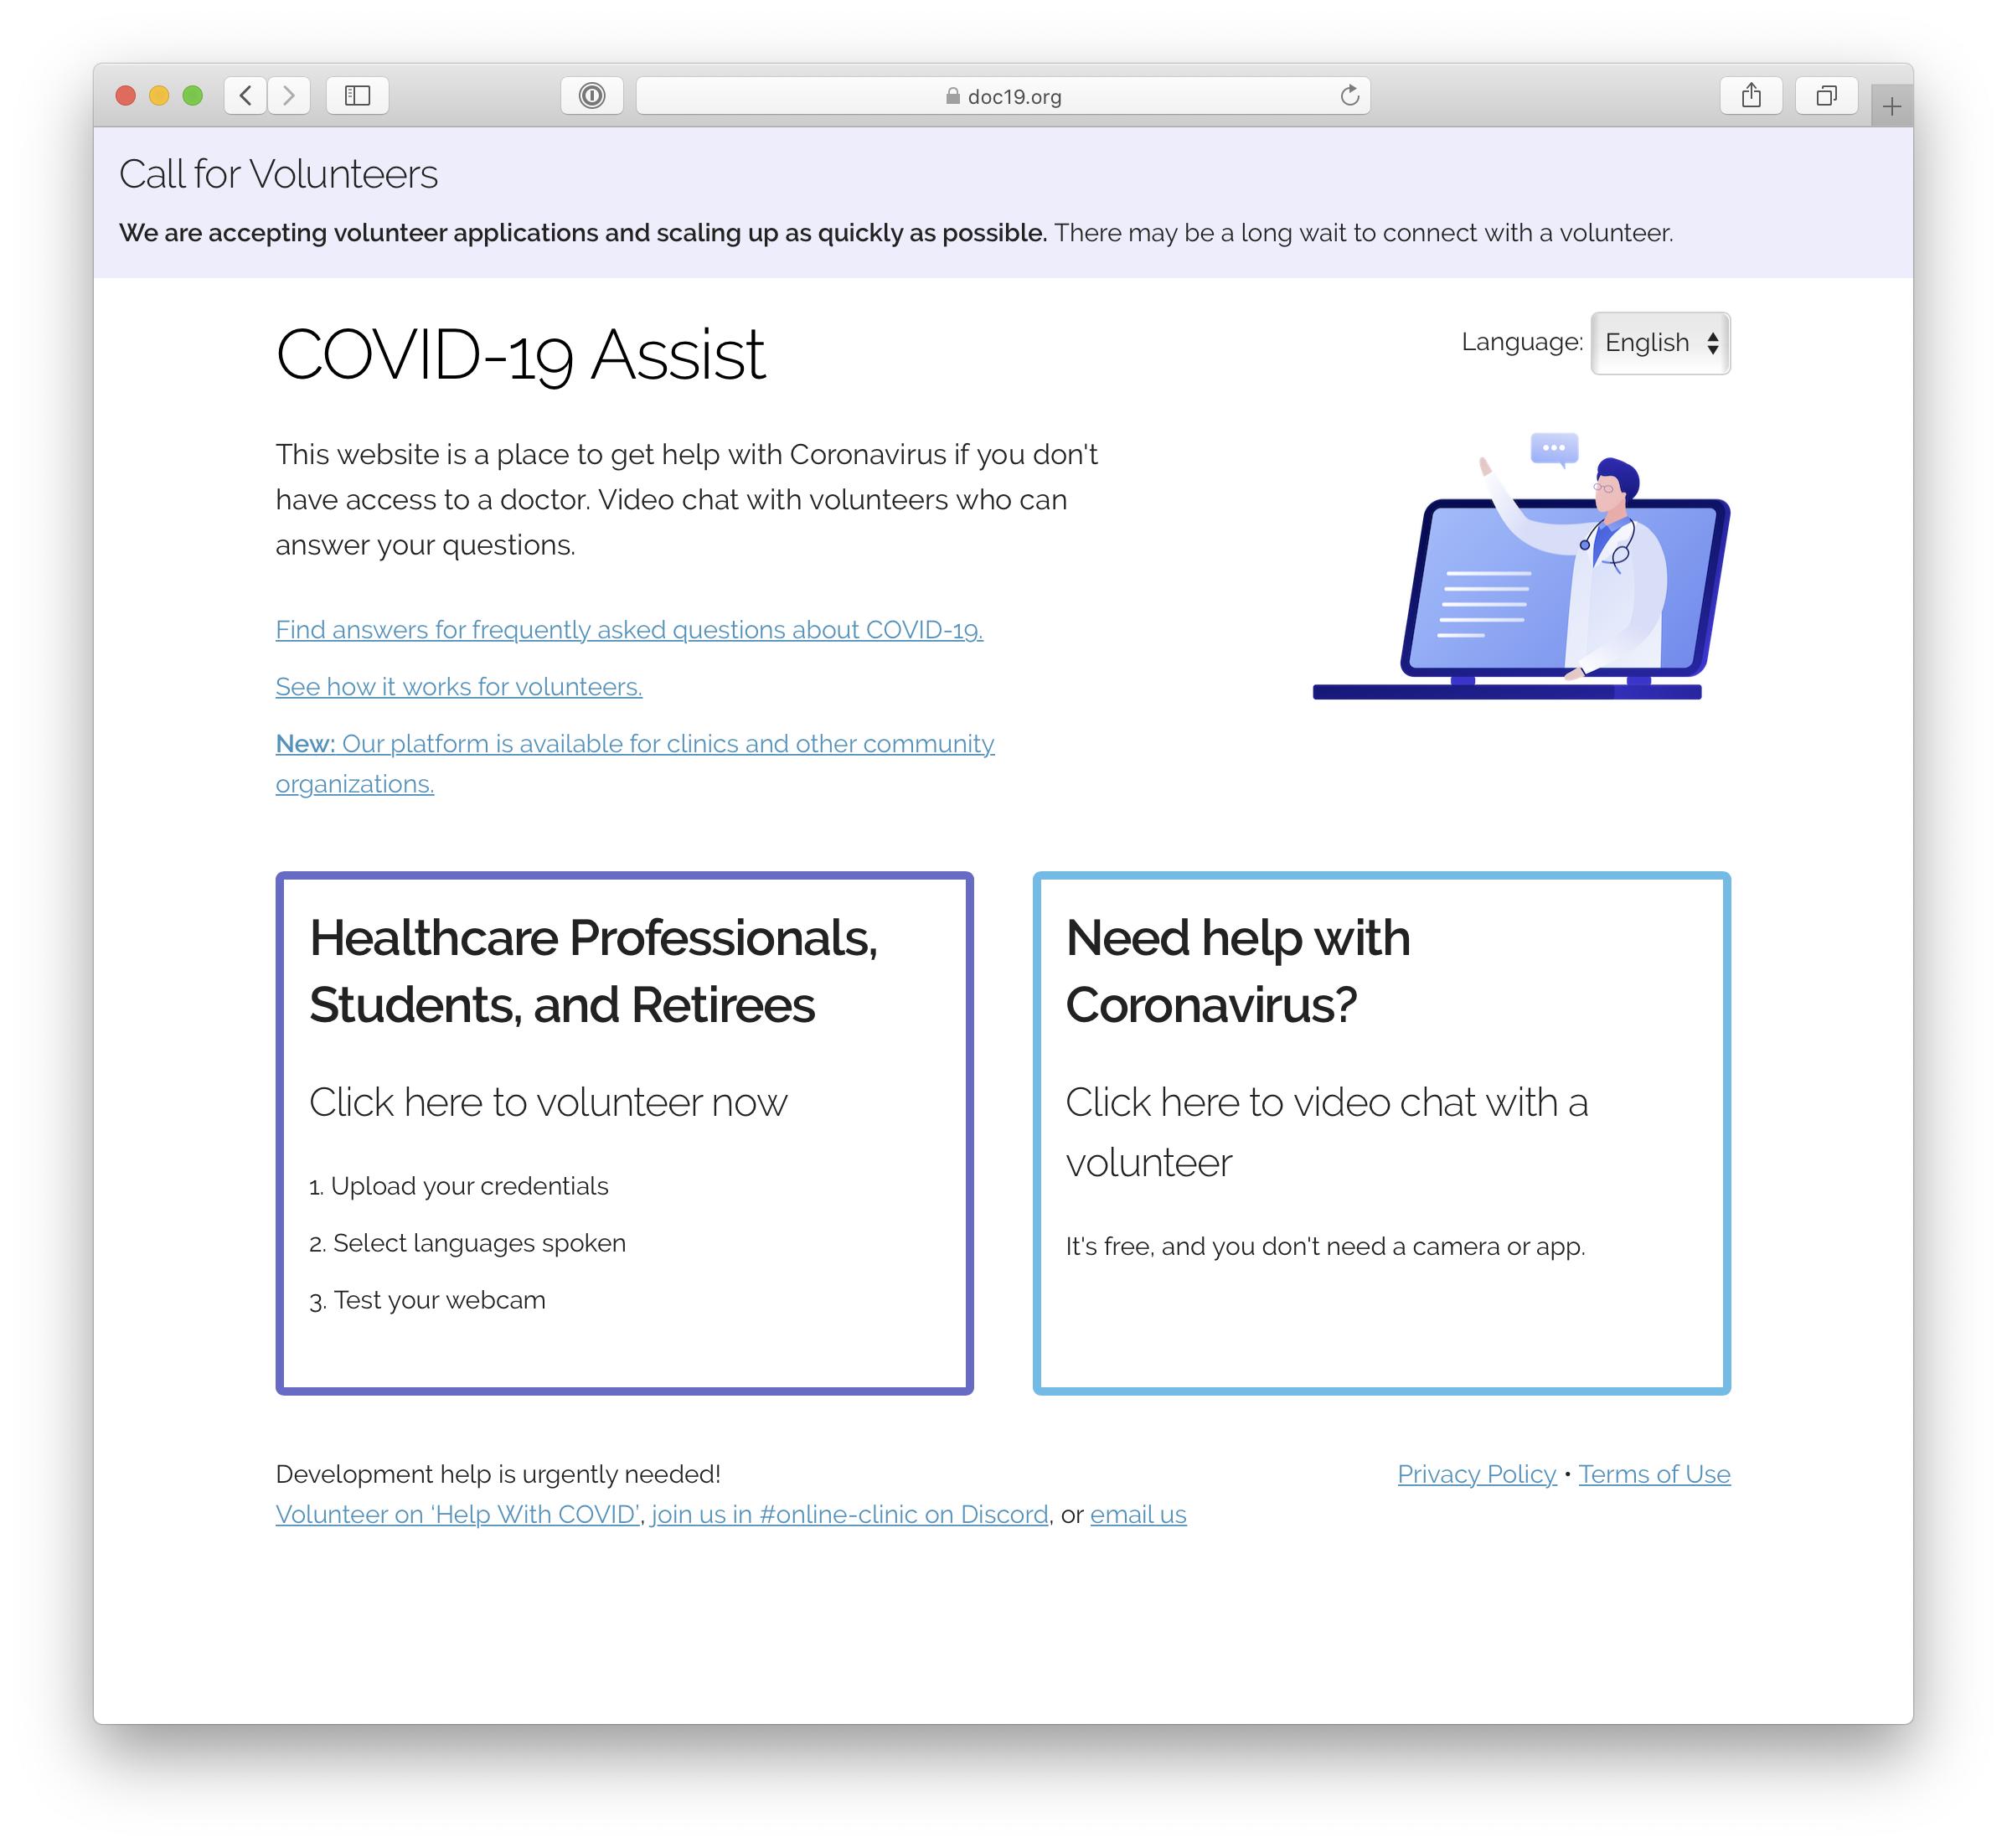 doc19.org - telehealth for COVID-19